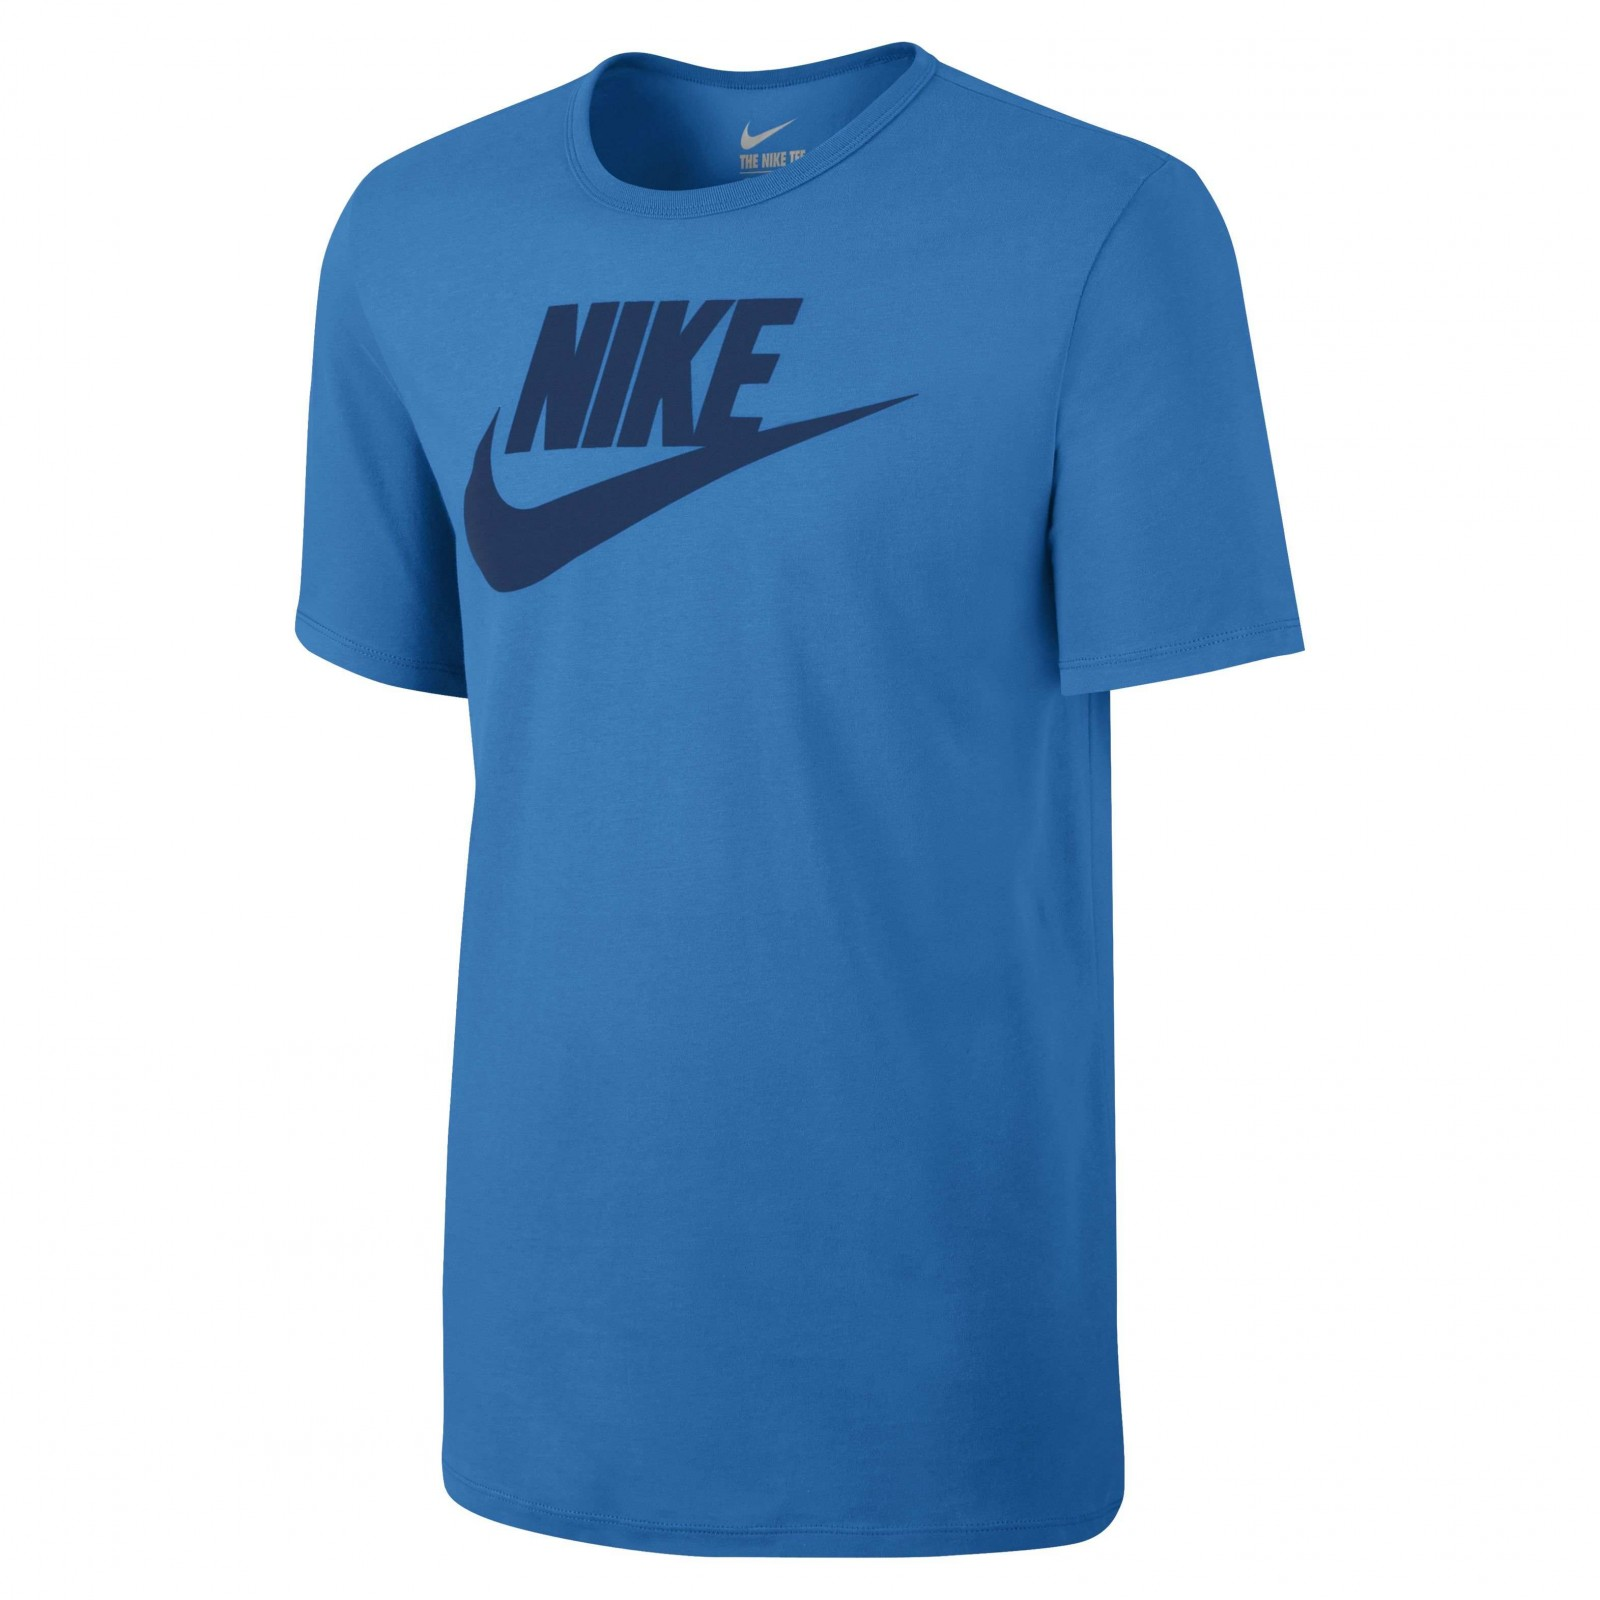 dd2f72058759 Pánské tričko Nike M NSW TEE ICON FUTURA